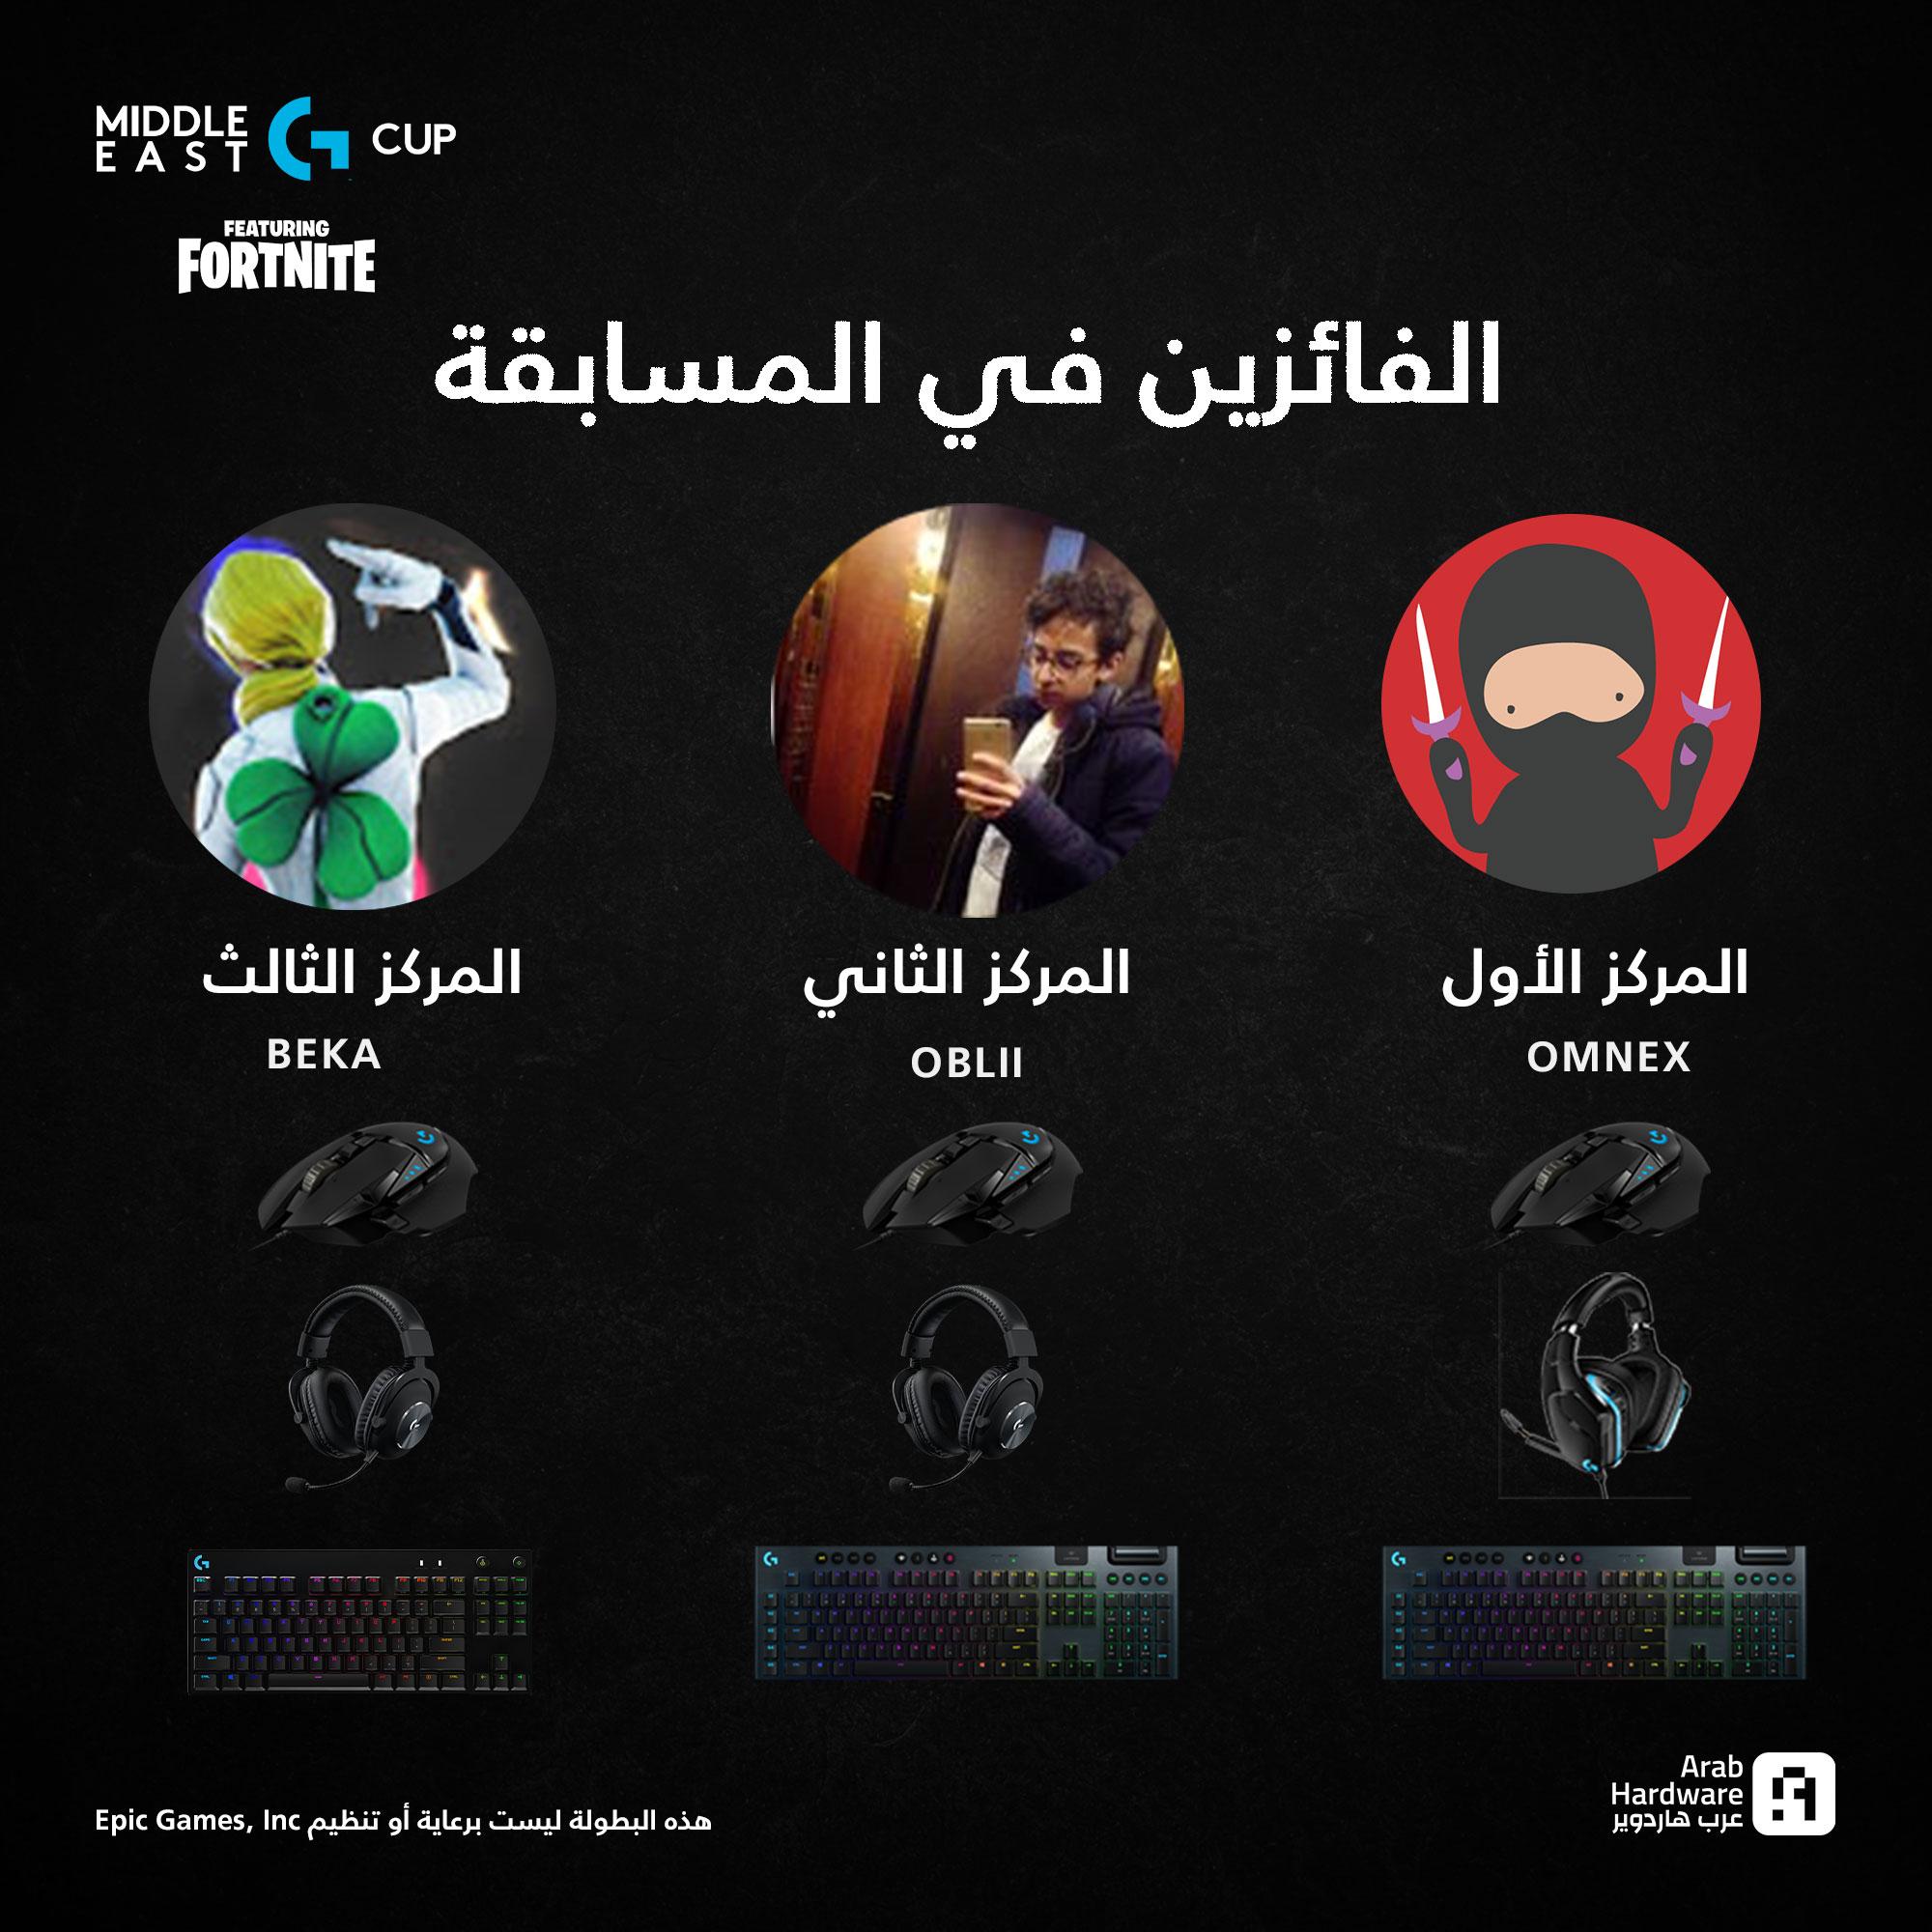 الفائزين في مسابقة Fortnite Middle East G Cup